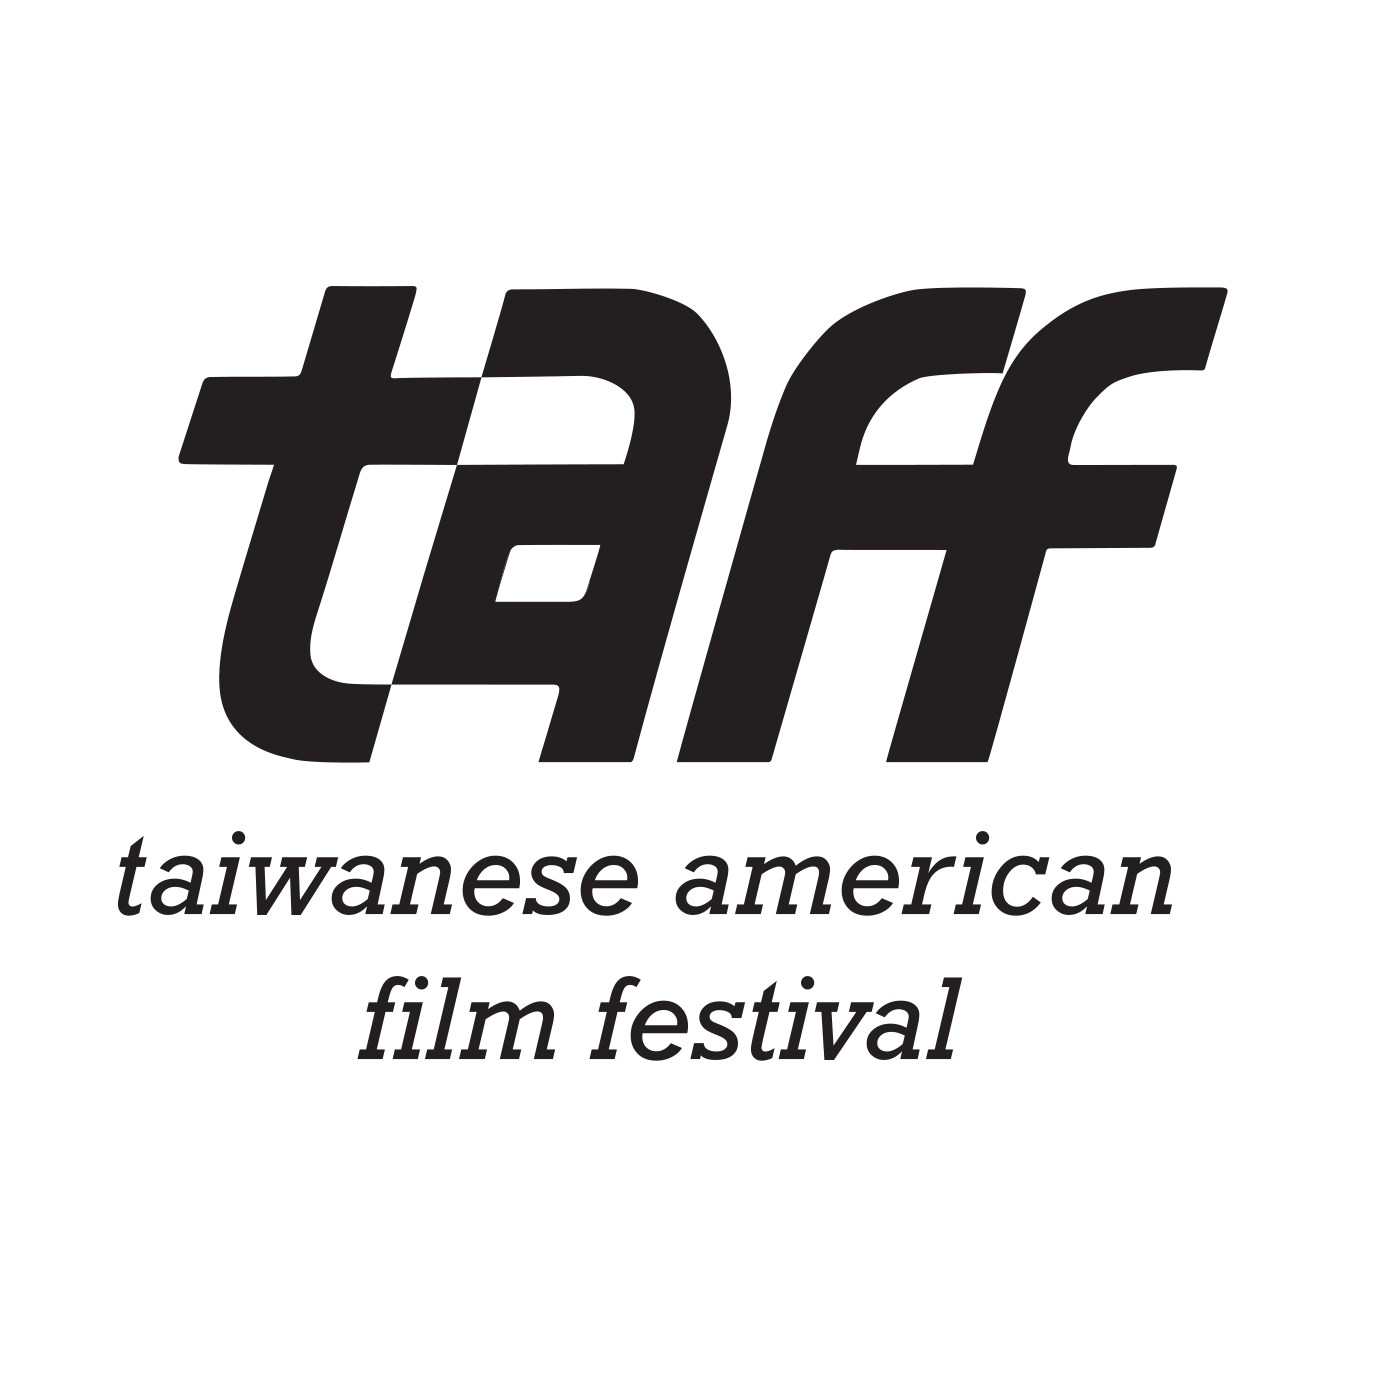 Taiwanese American Film Festival